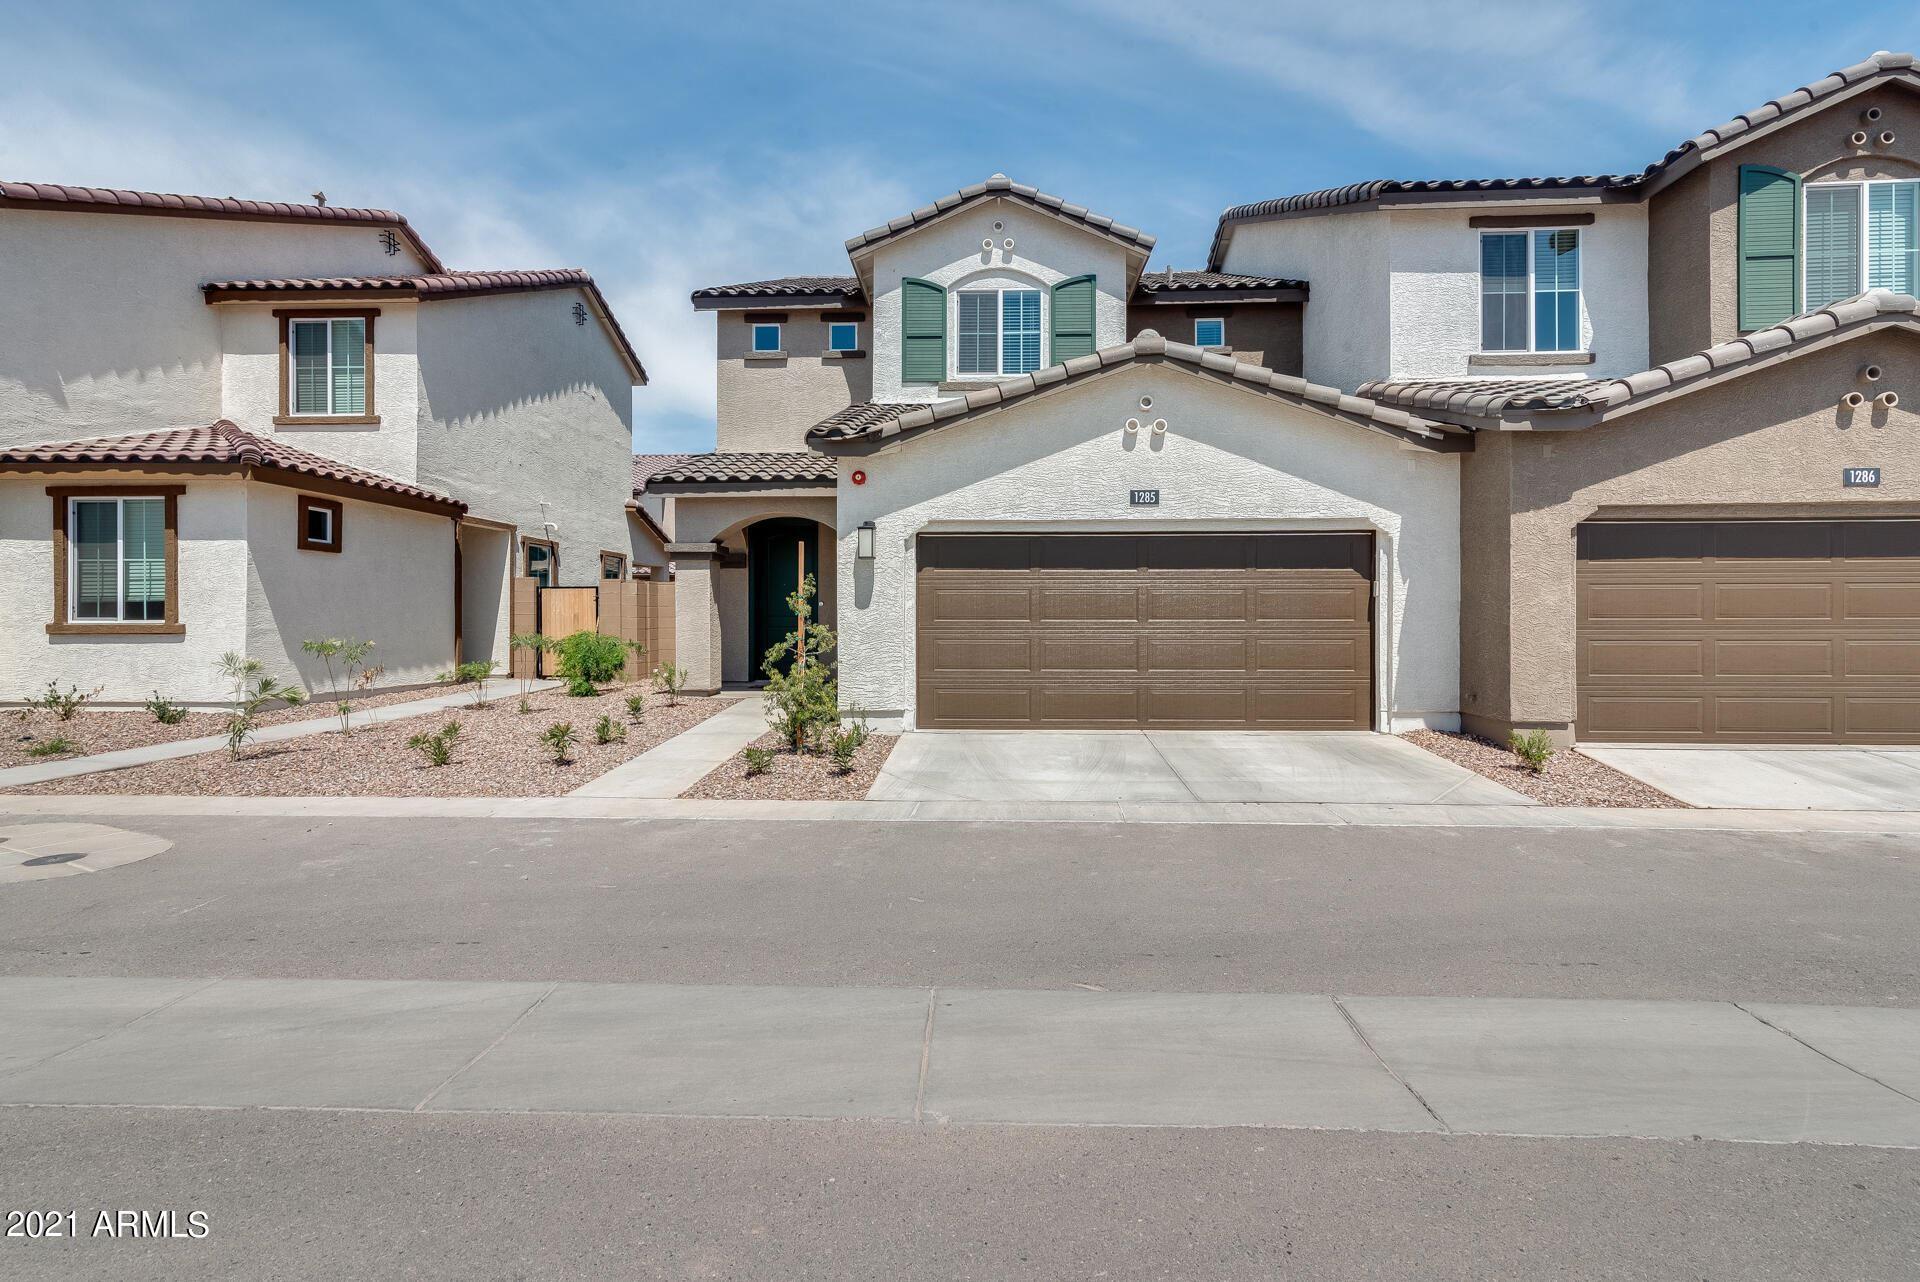 1255 N ARIZONA Avenue #1285, Chandler, AZ 85225 - MLS#: 6288358